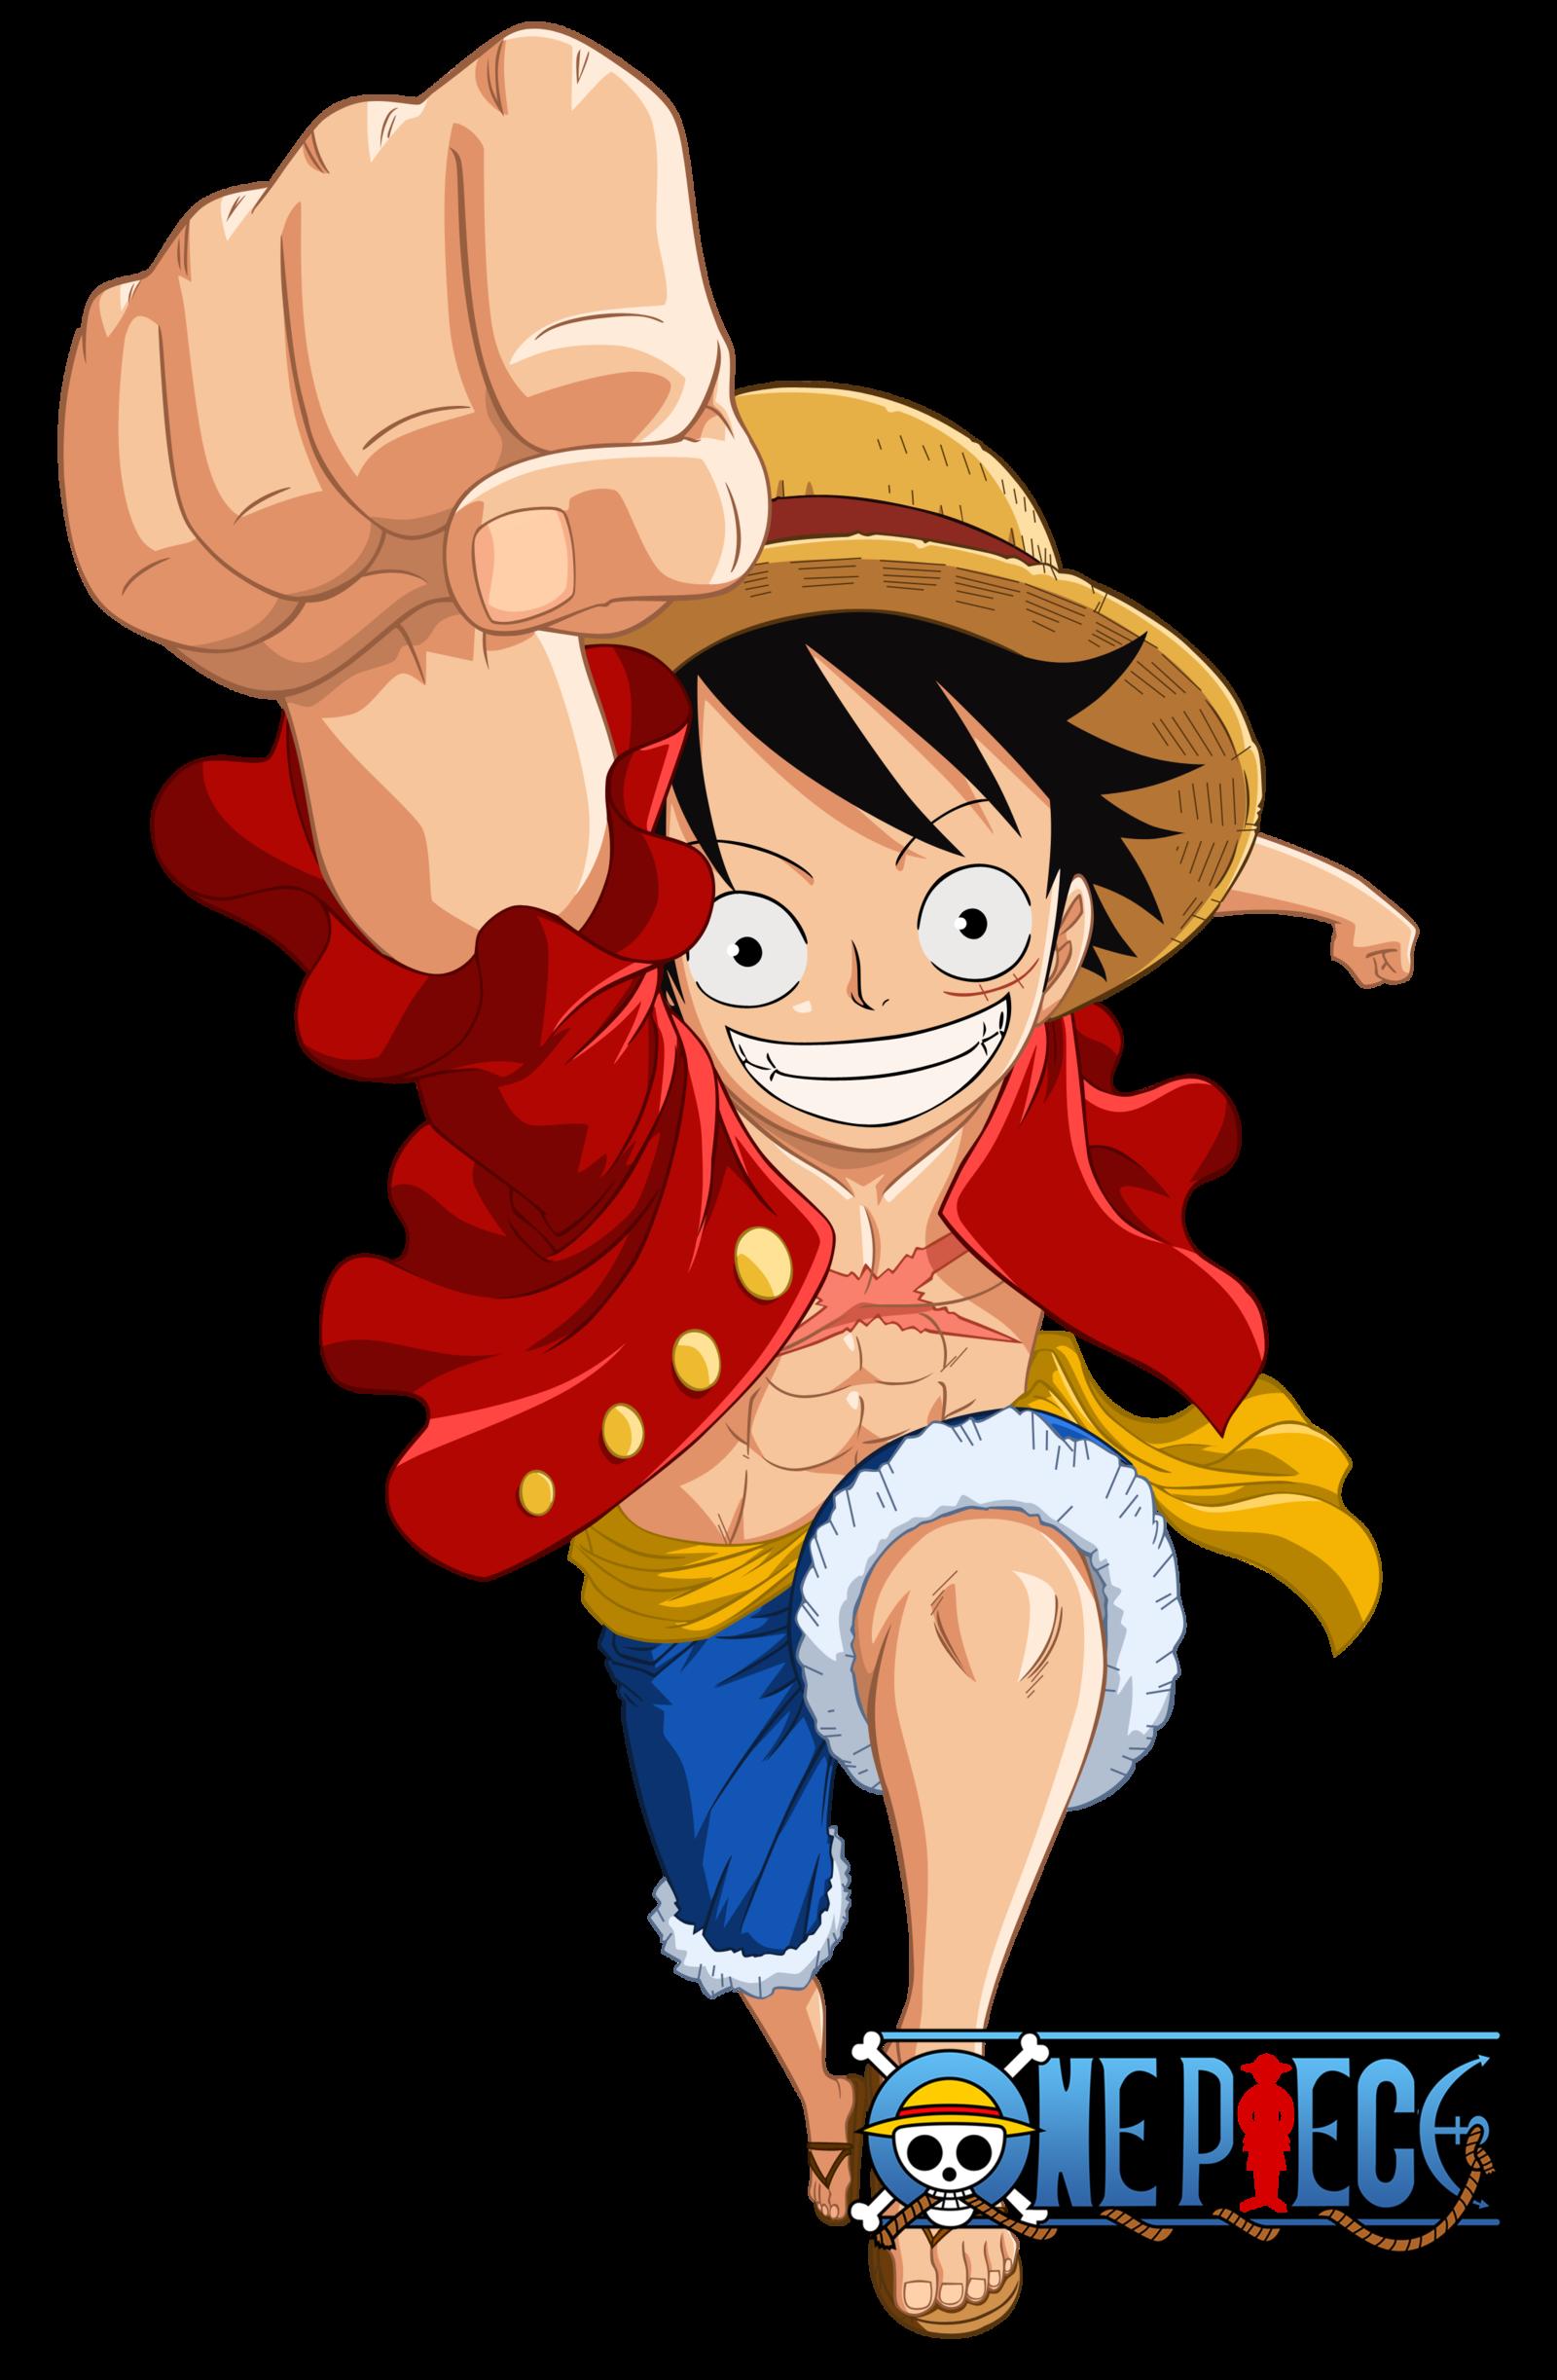 Download Monkey D Luffy Transparent Hq Png Image Freepngimg